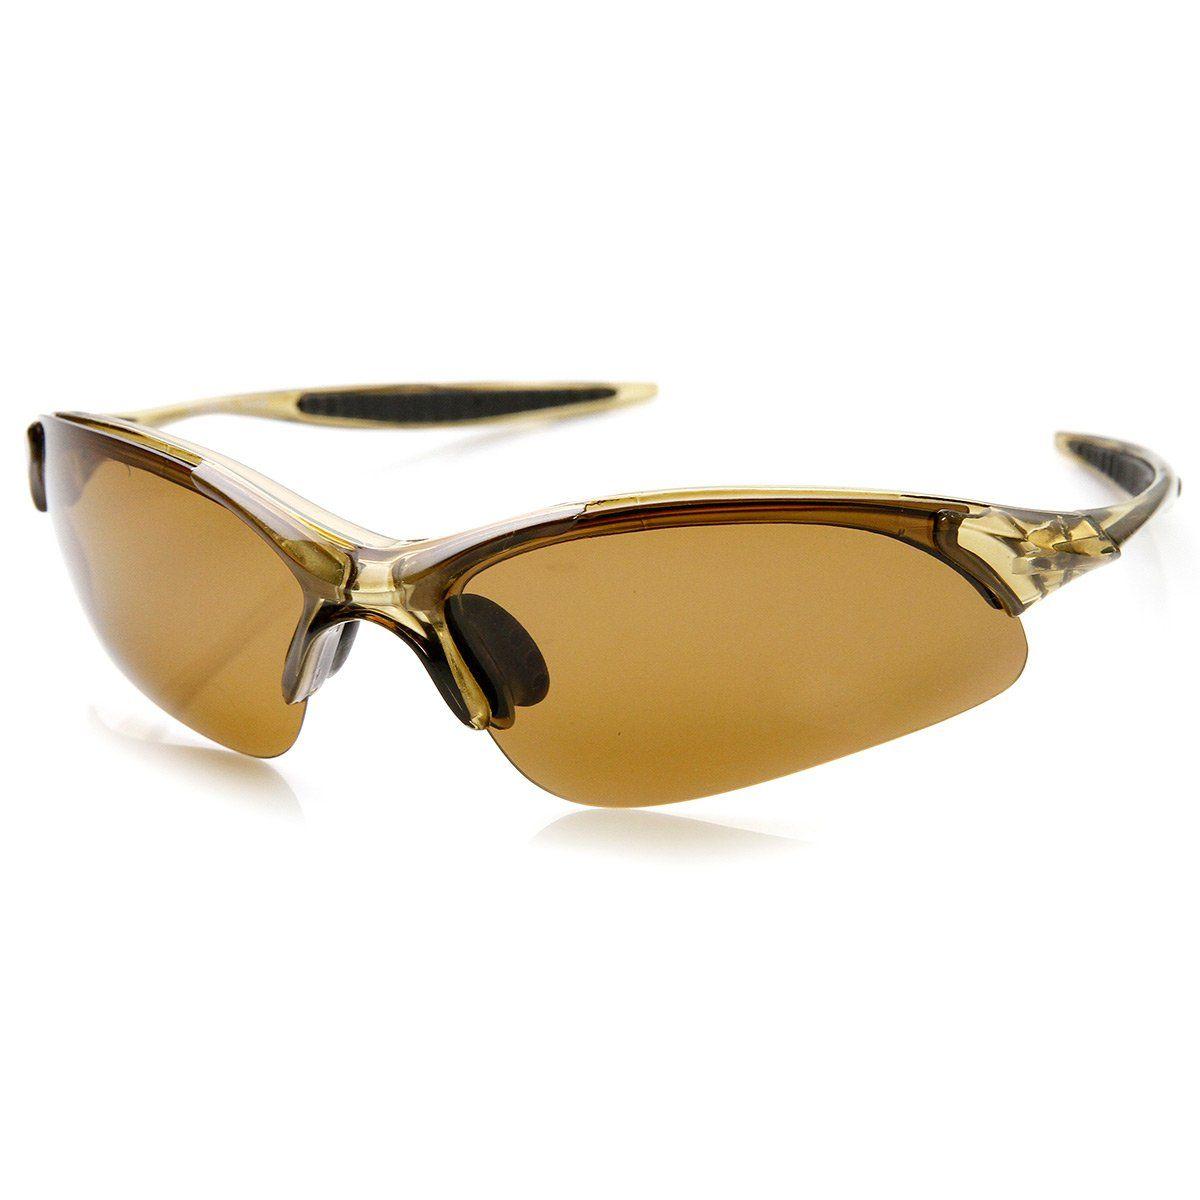 fca2b28f8f50d Lightweight Shatterproof TR90 Half Jacket Polarized Lens Sports Sunglasses